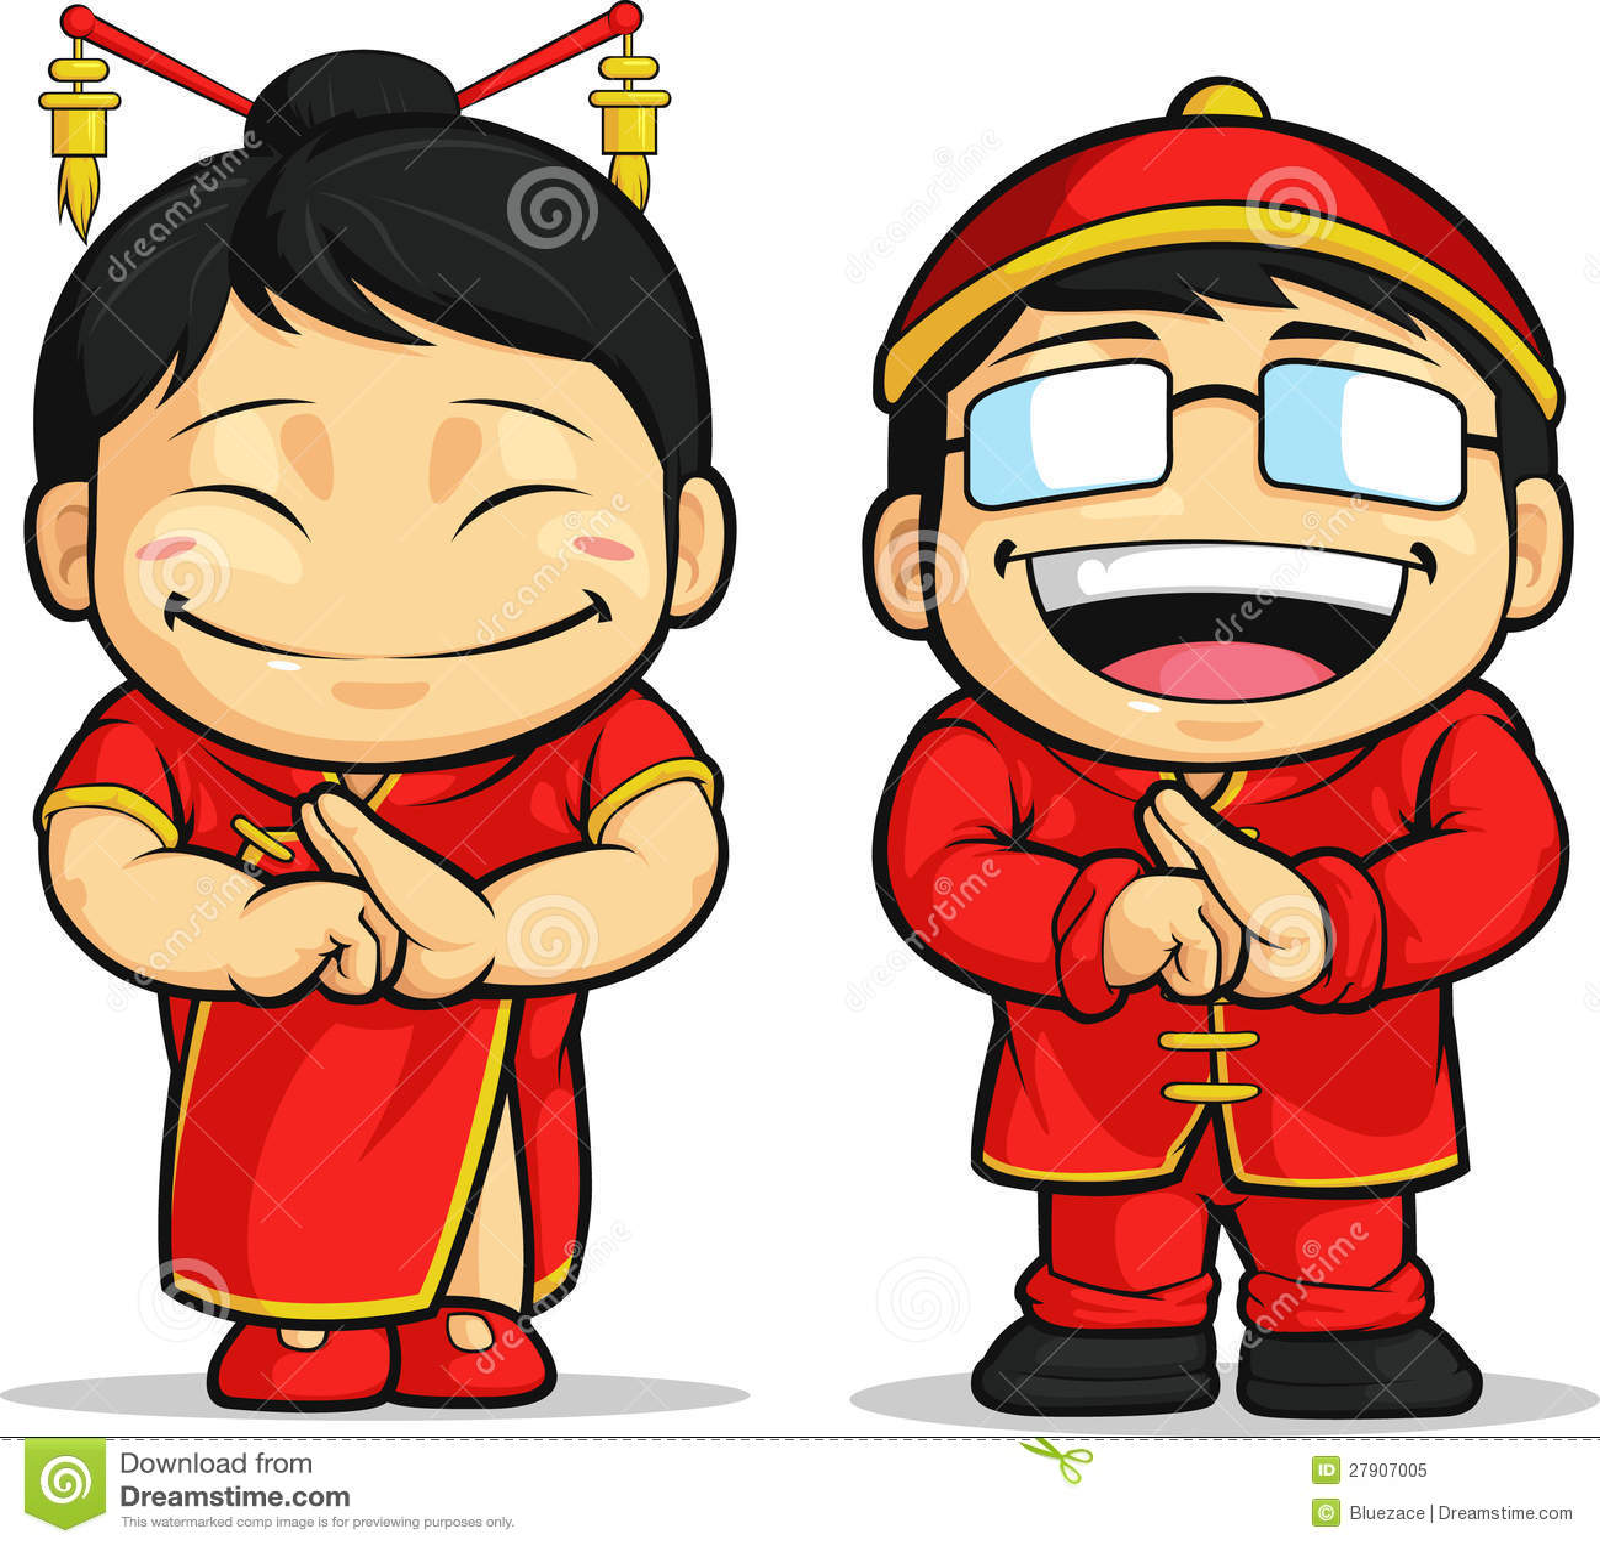 dessin anim de gar on et de fille chinois illustration de vecteur illustration du oriental. Black Bedroom Furniture Sets. Home Design Ideas